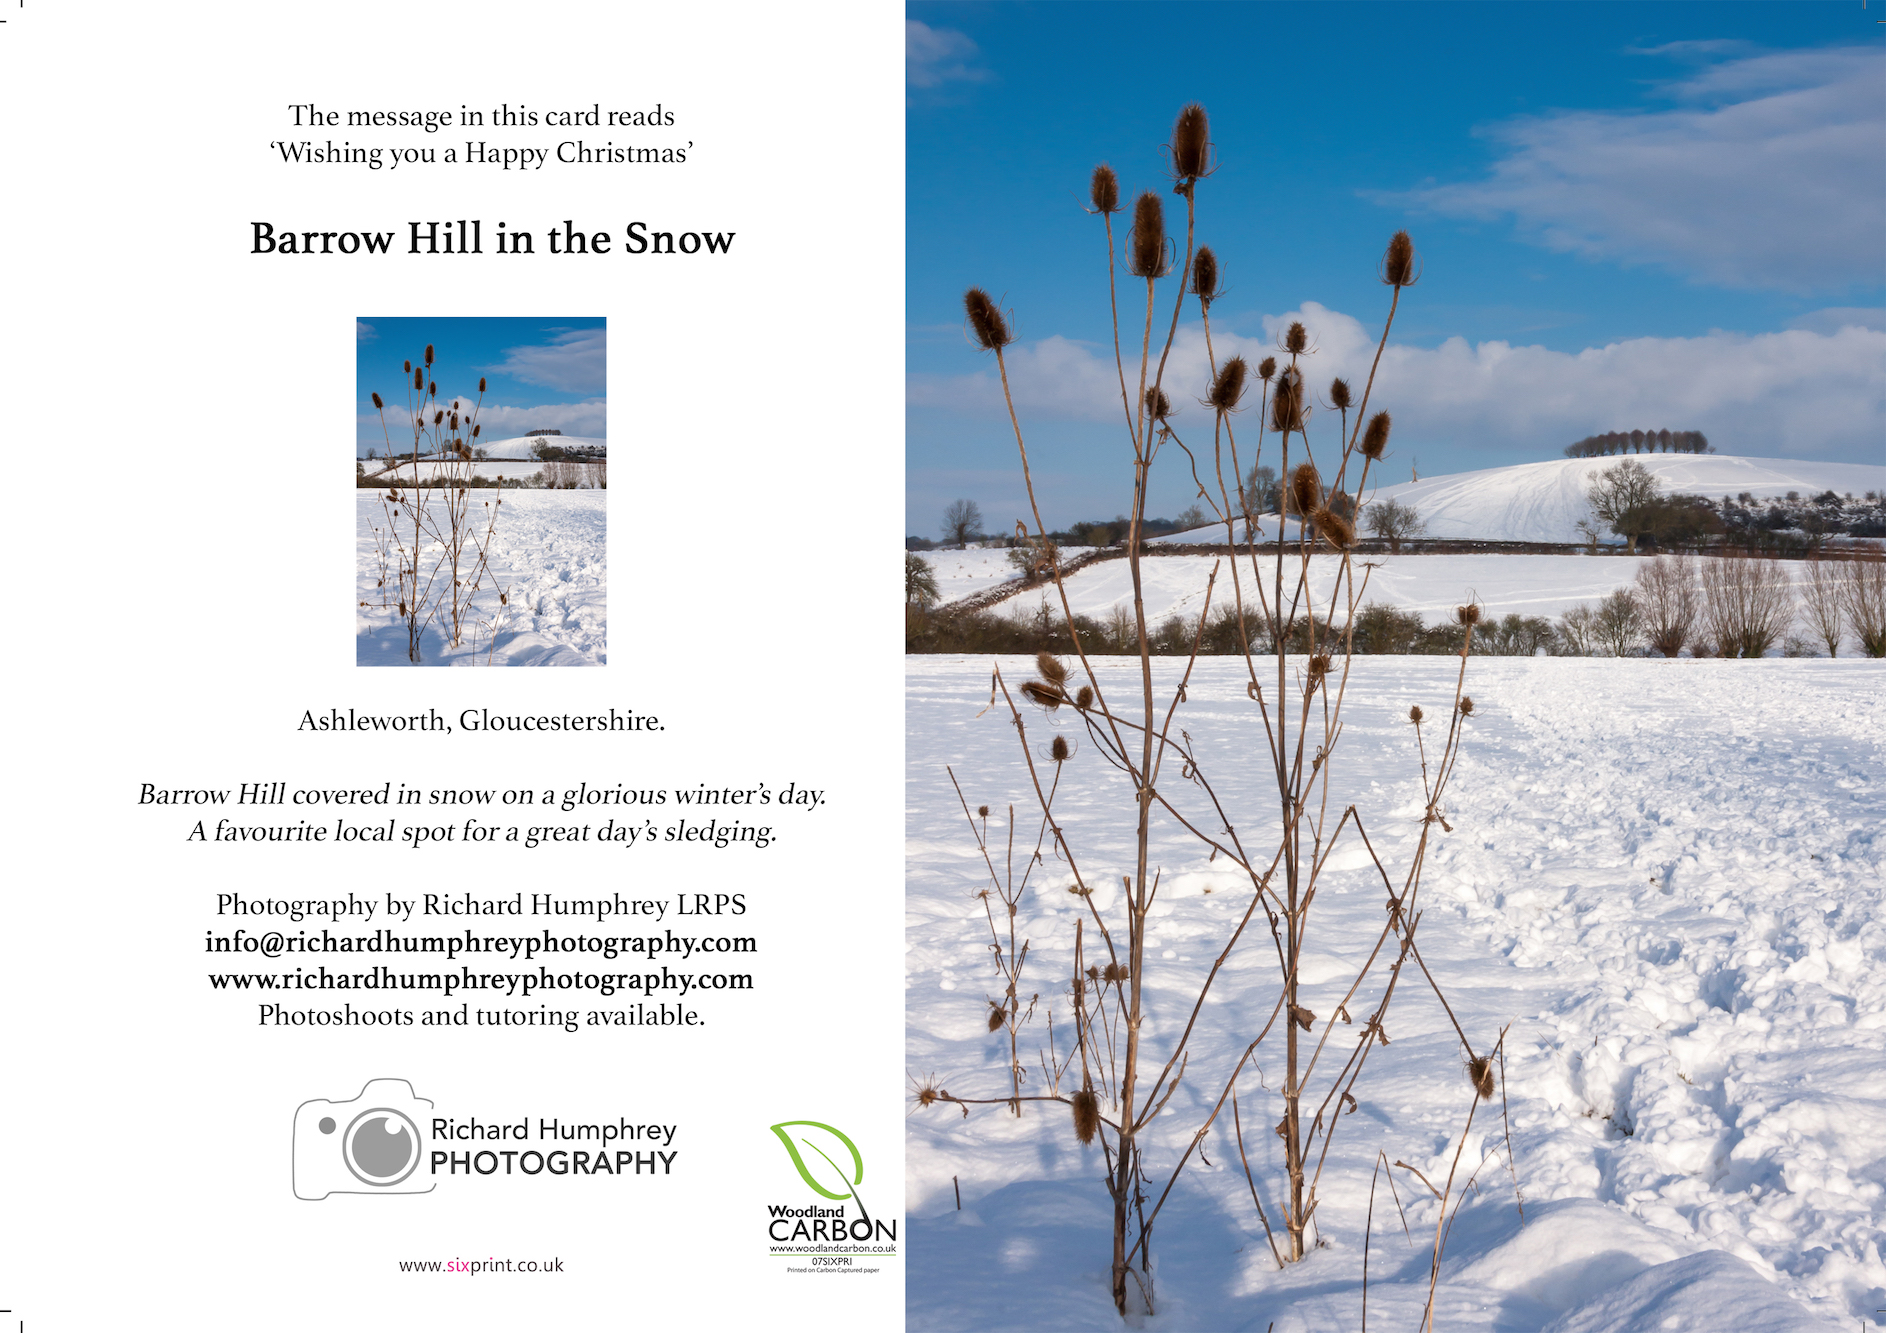 Barrow Hill in Snow